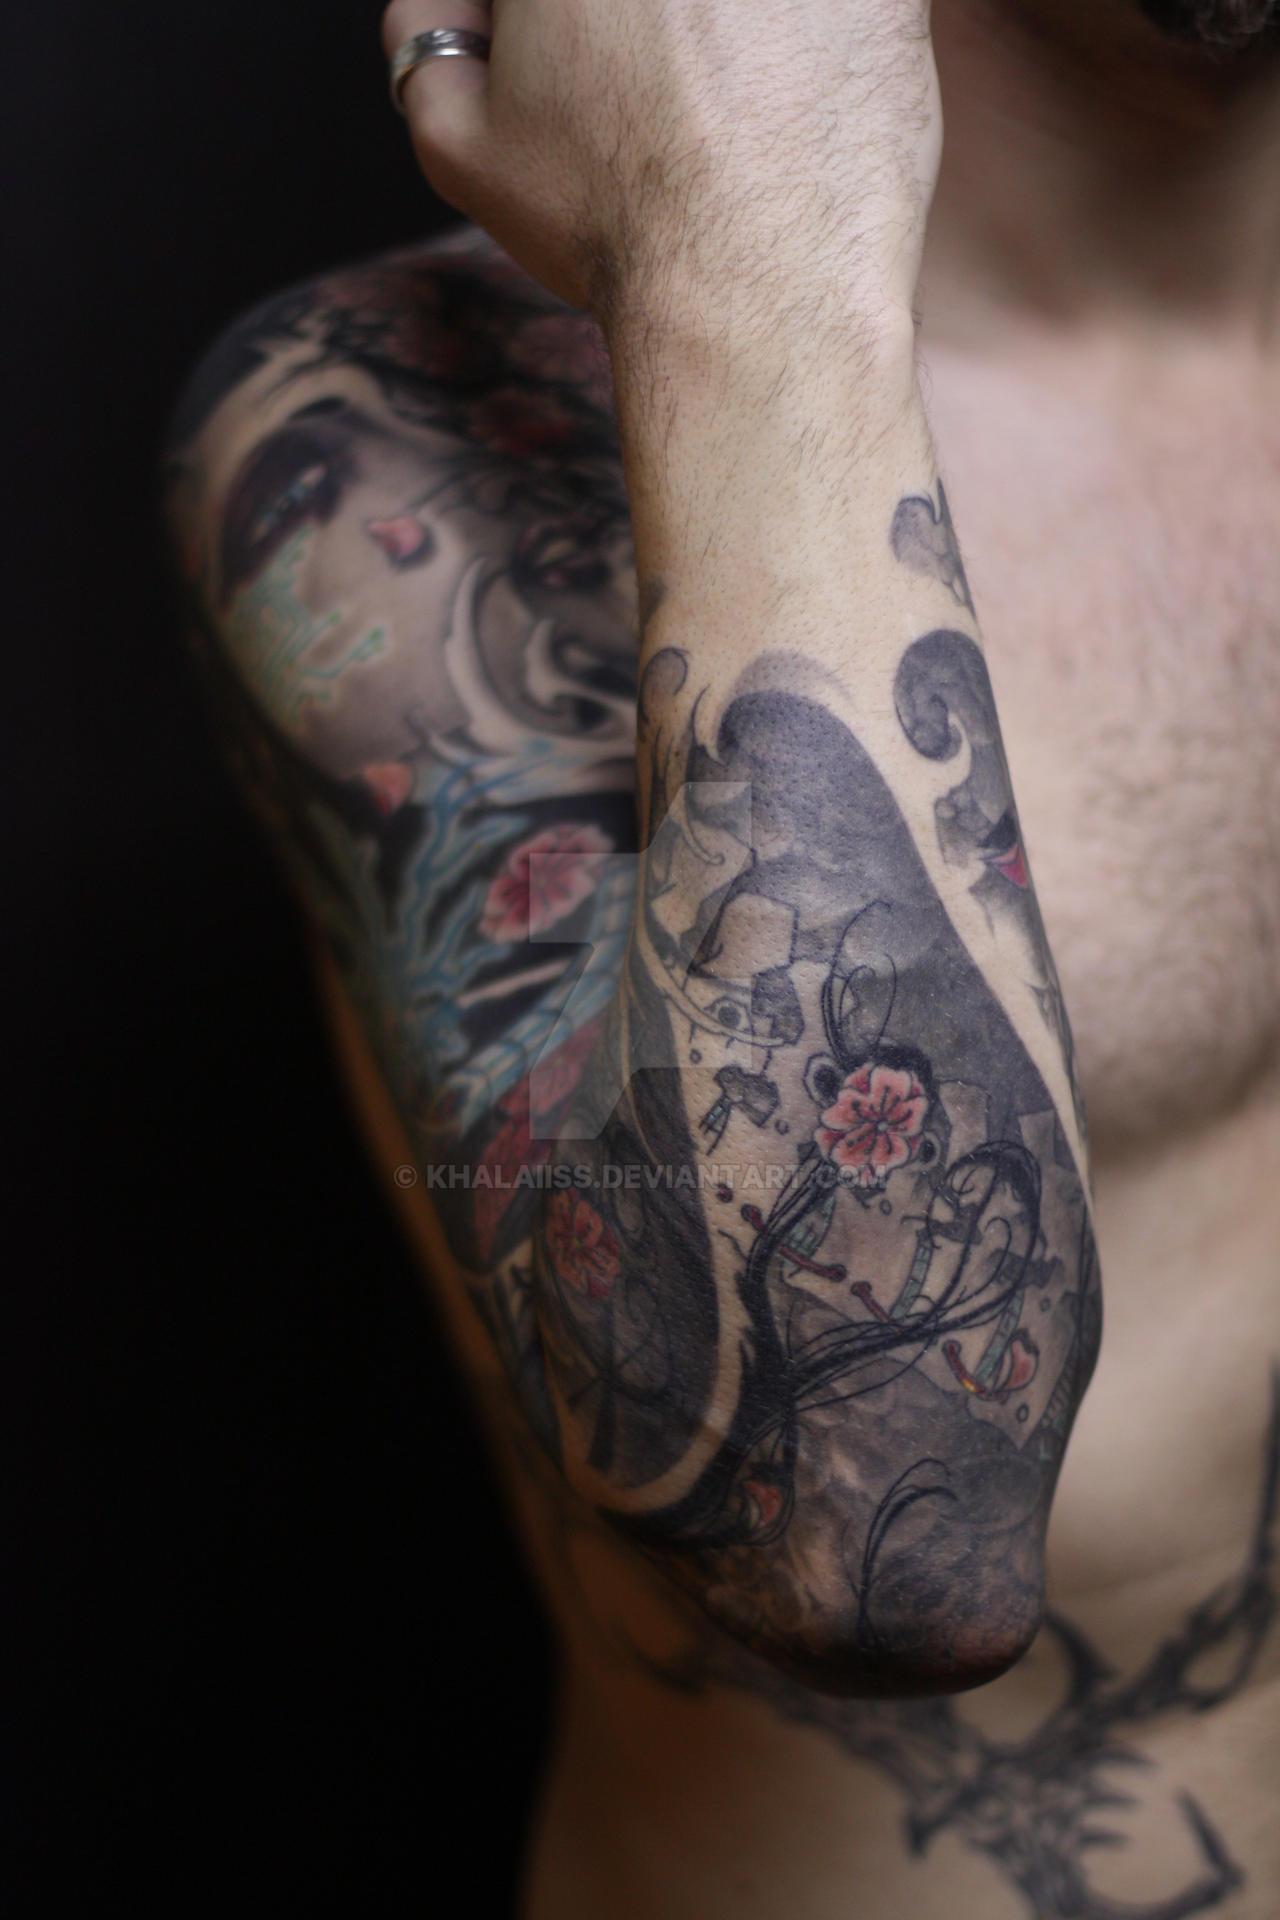 Japanese Tattoo Forearm By Khalaiiss On Deviantart